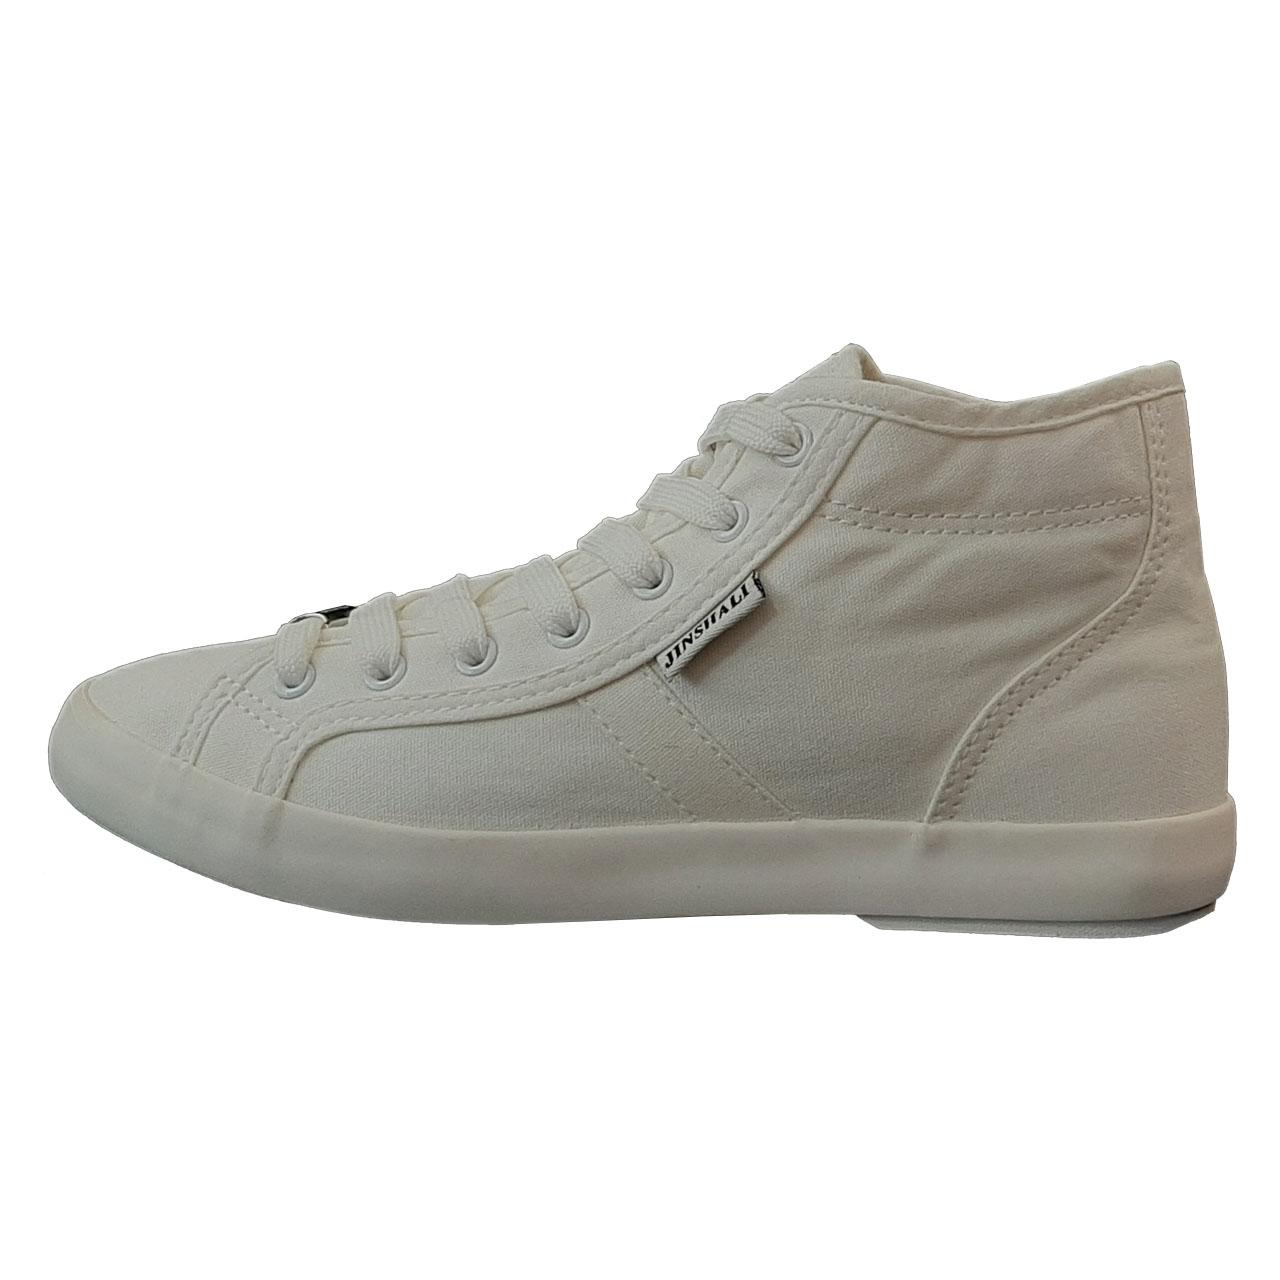 کفش راحتی زنانه جینشالی کد 259